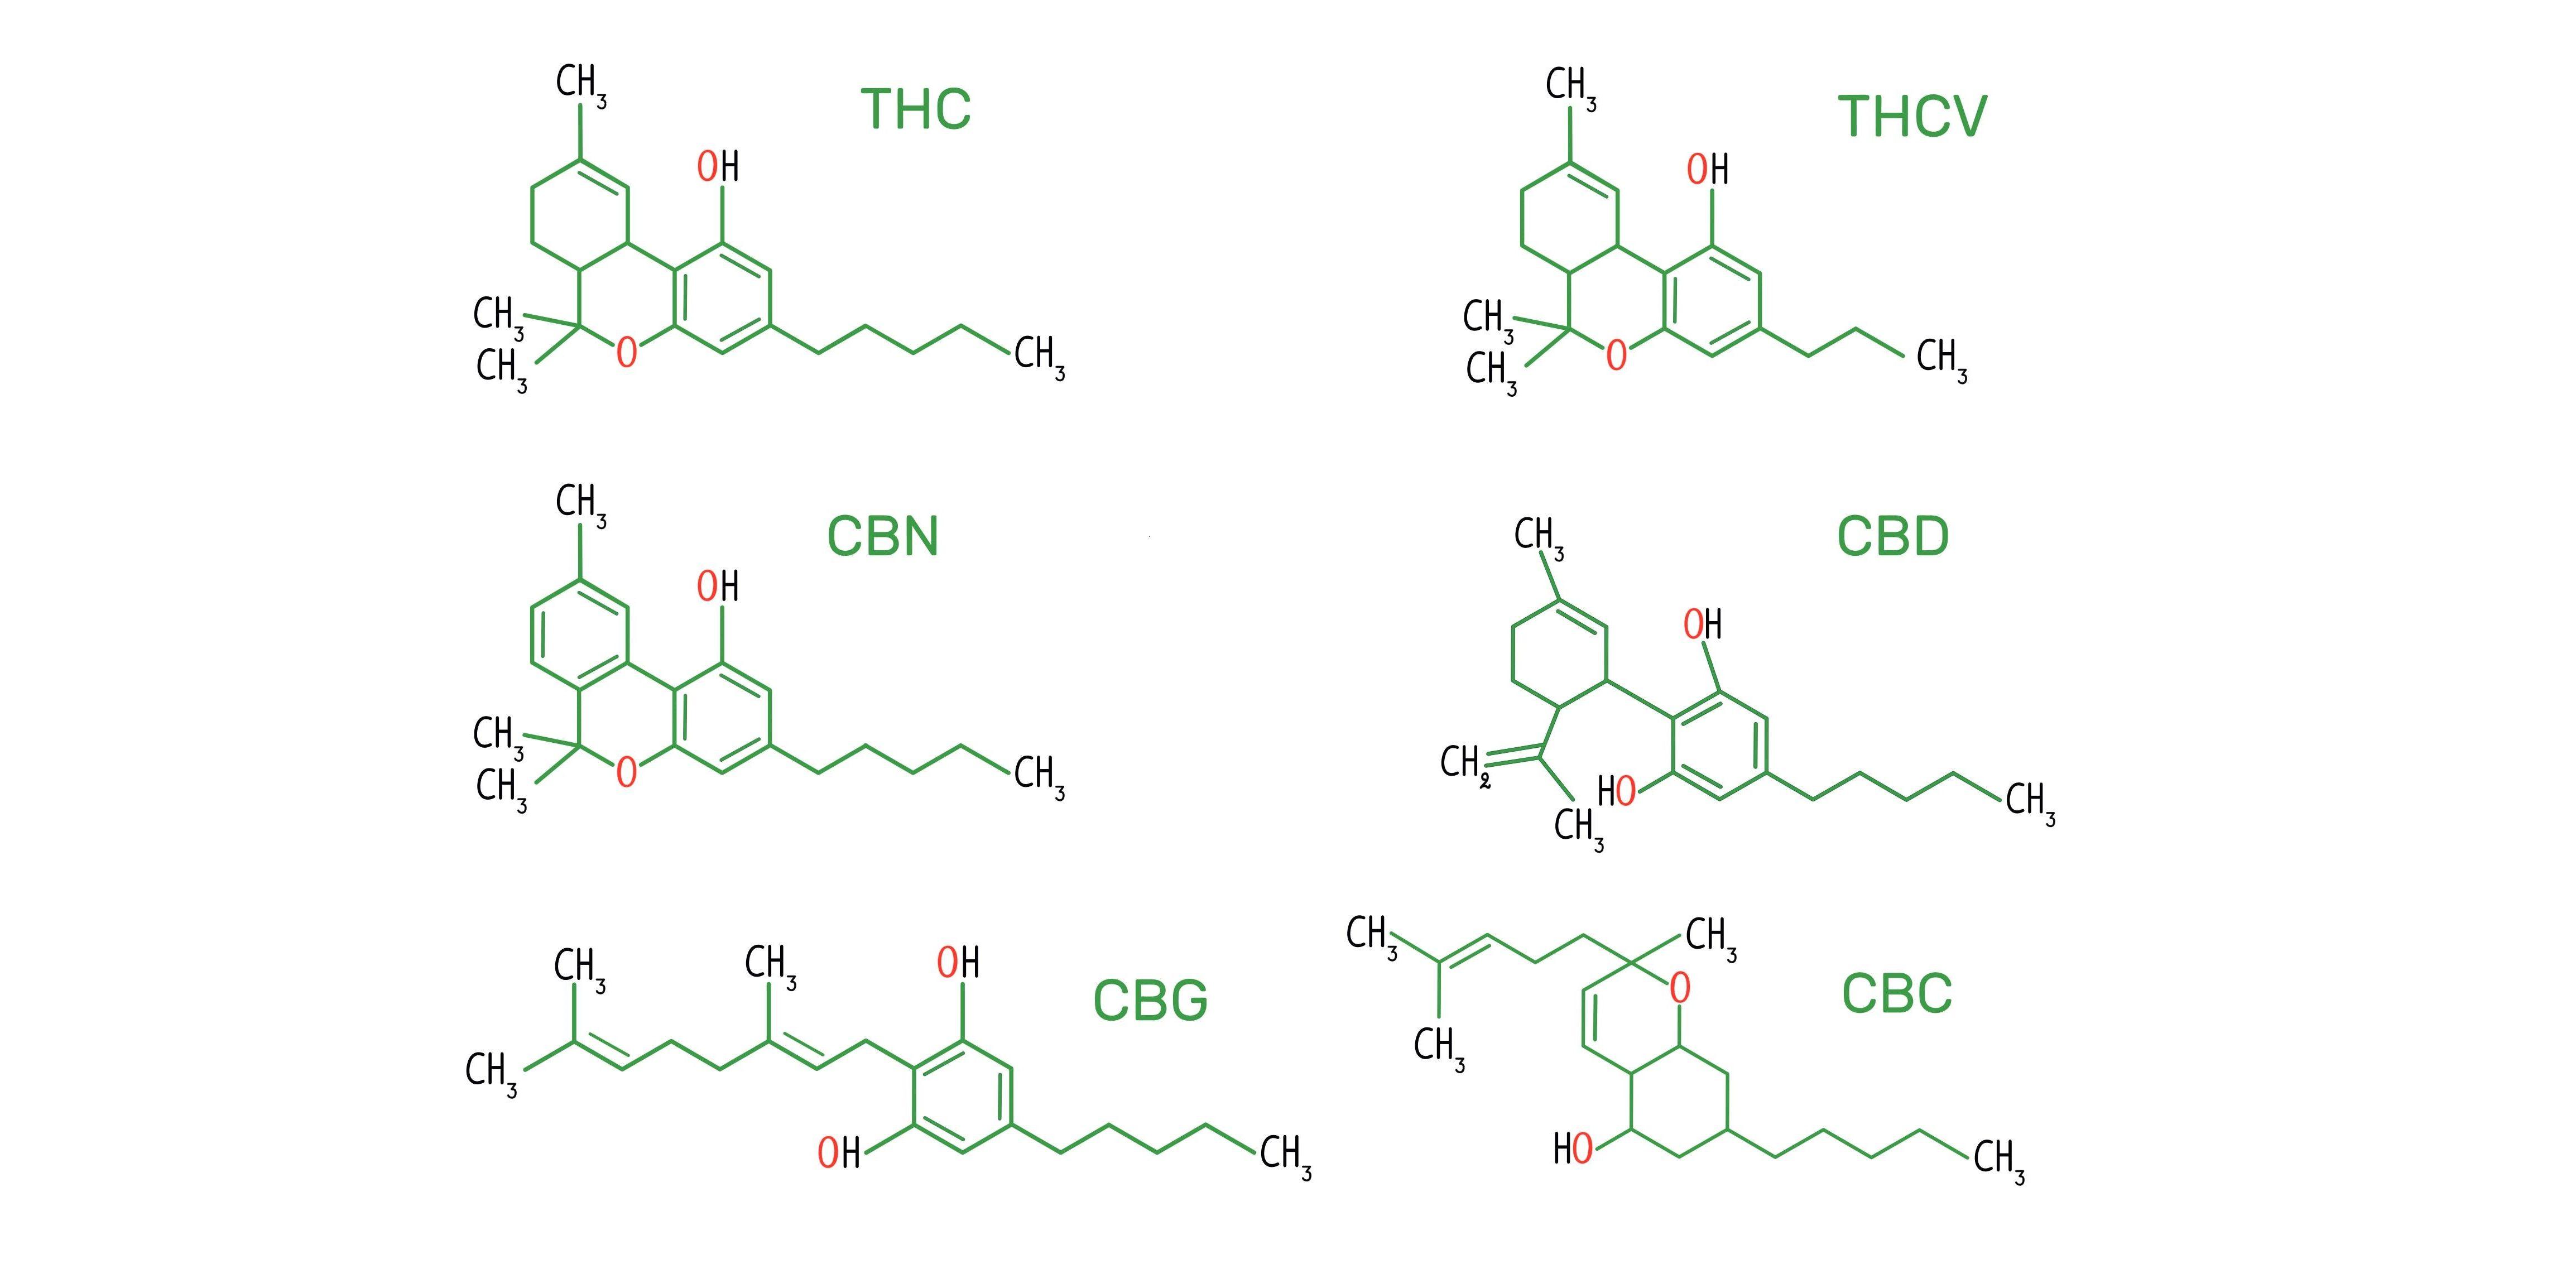 Cannabis Bei Sportlern Beliebt Rauschmittel Medizin Oder